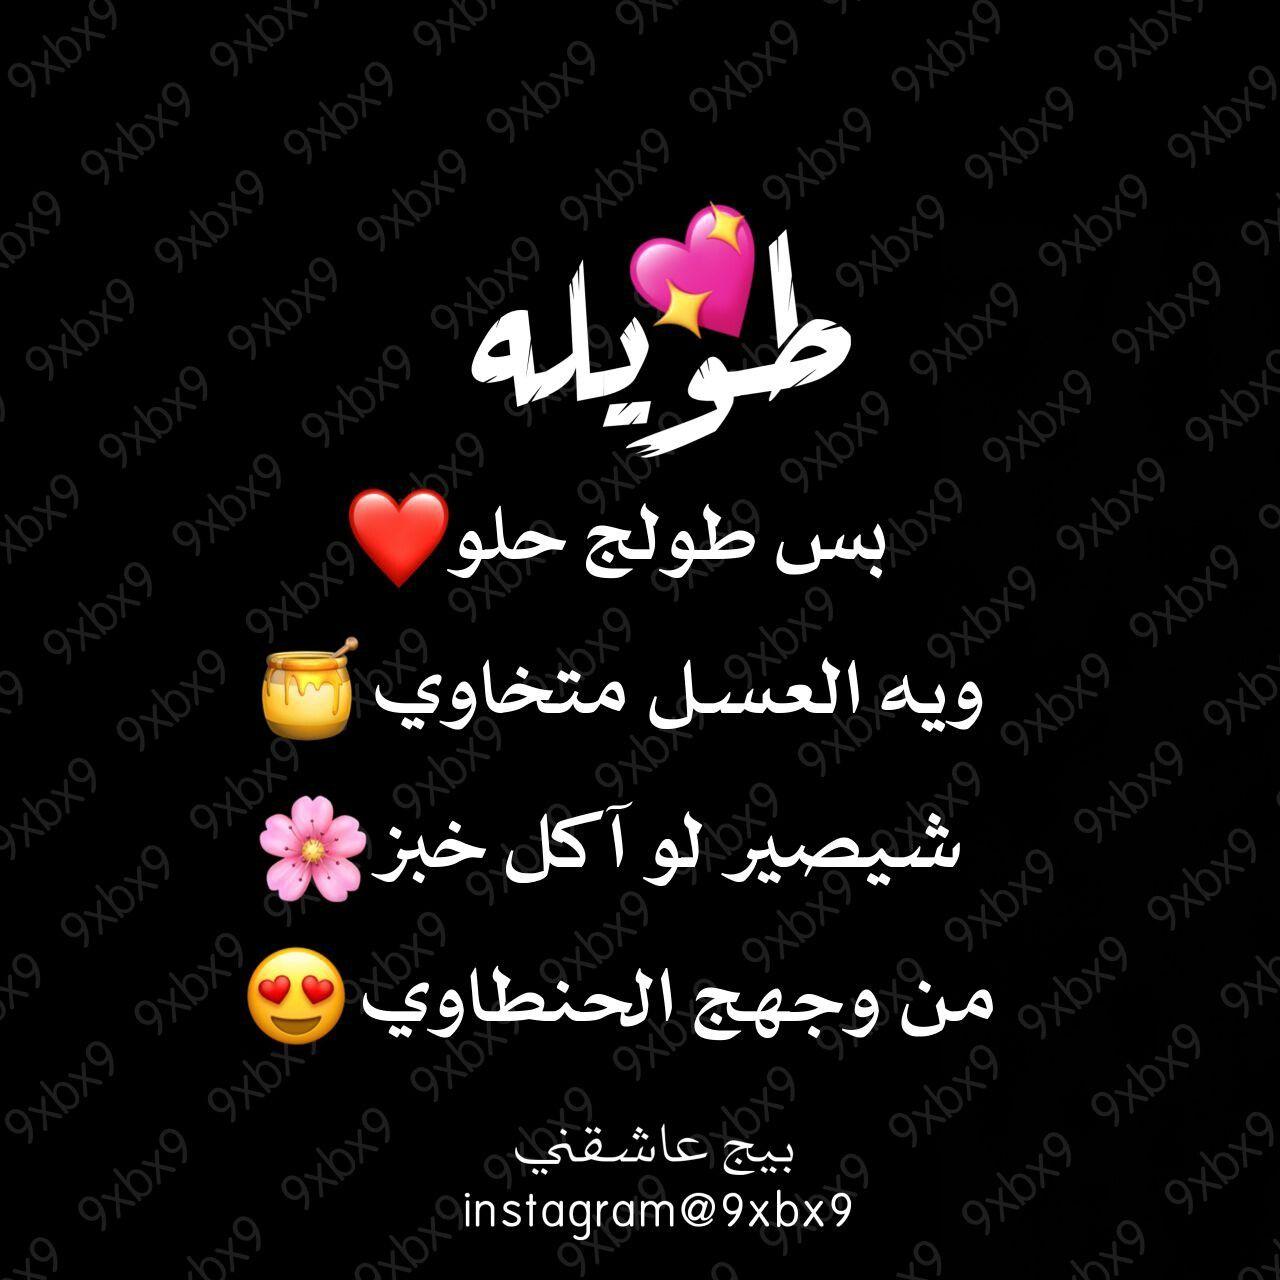 غزل طويله Pretty Quotes Arabic Jokes Aesthetic Wallpapers